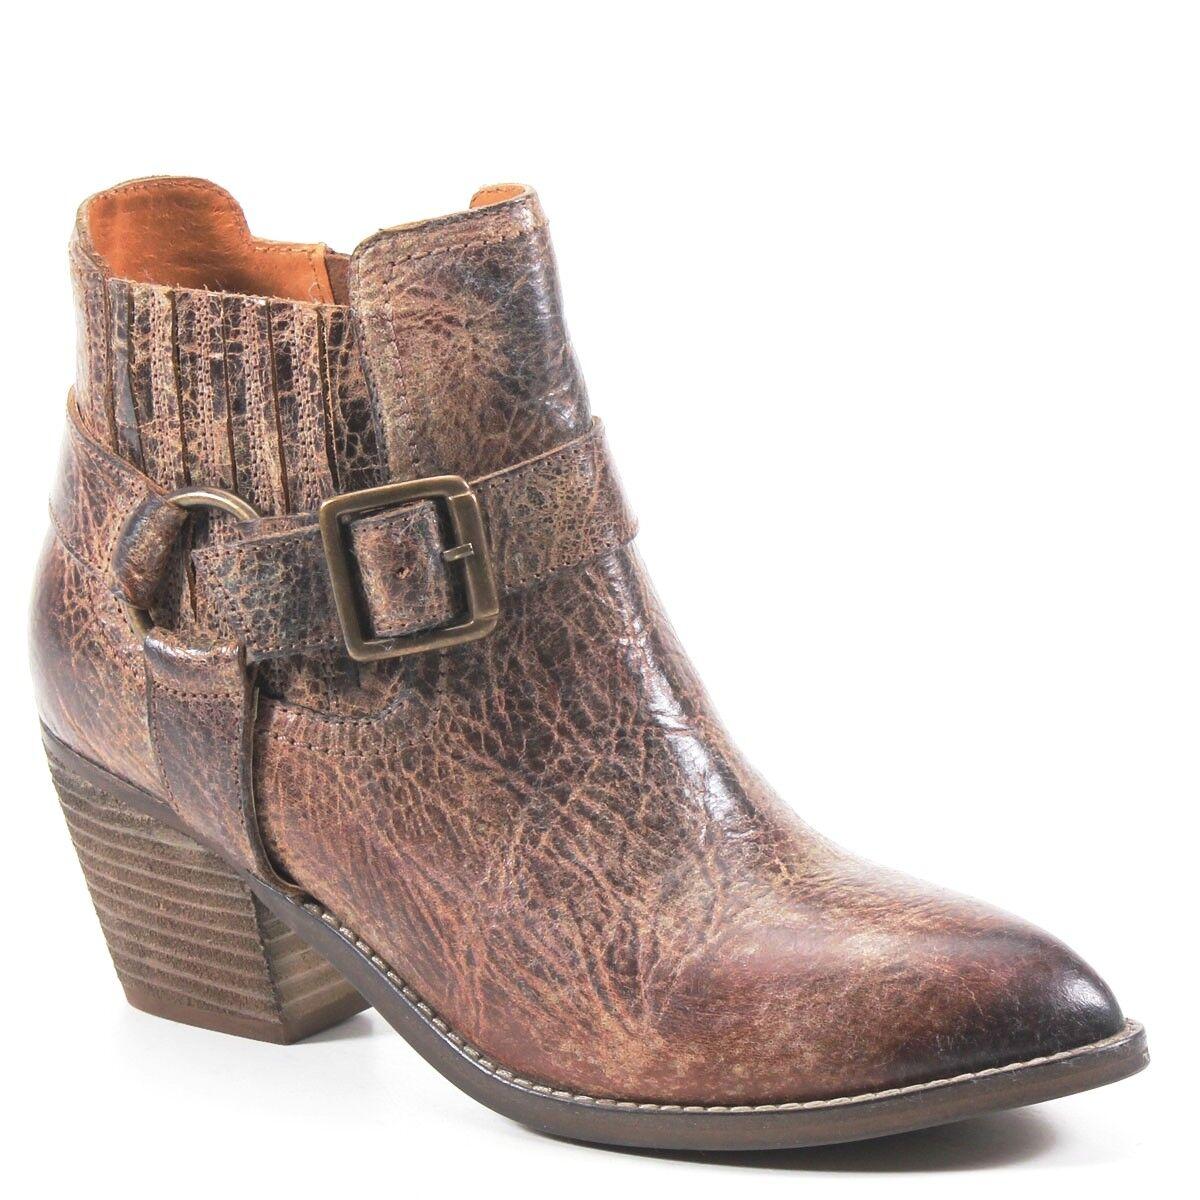 Nuova lista Diba True Ladies Mud Play Vintage Tan Marrone Buckle avvioies avvioies avvioies 33520  risparmia fino al 70% di sconto